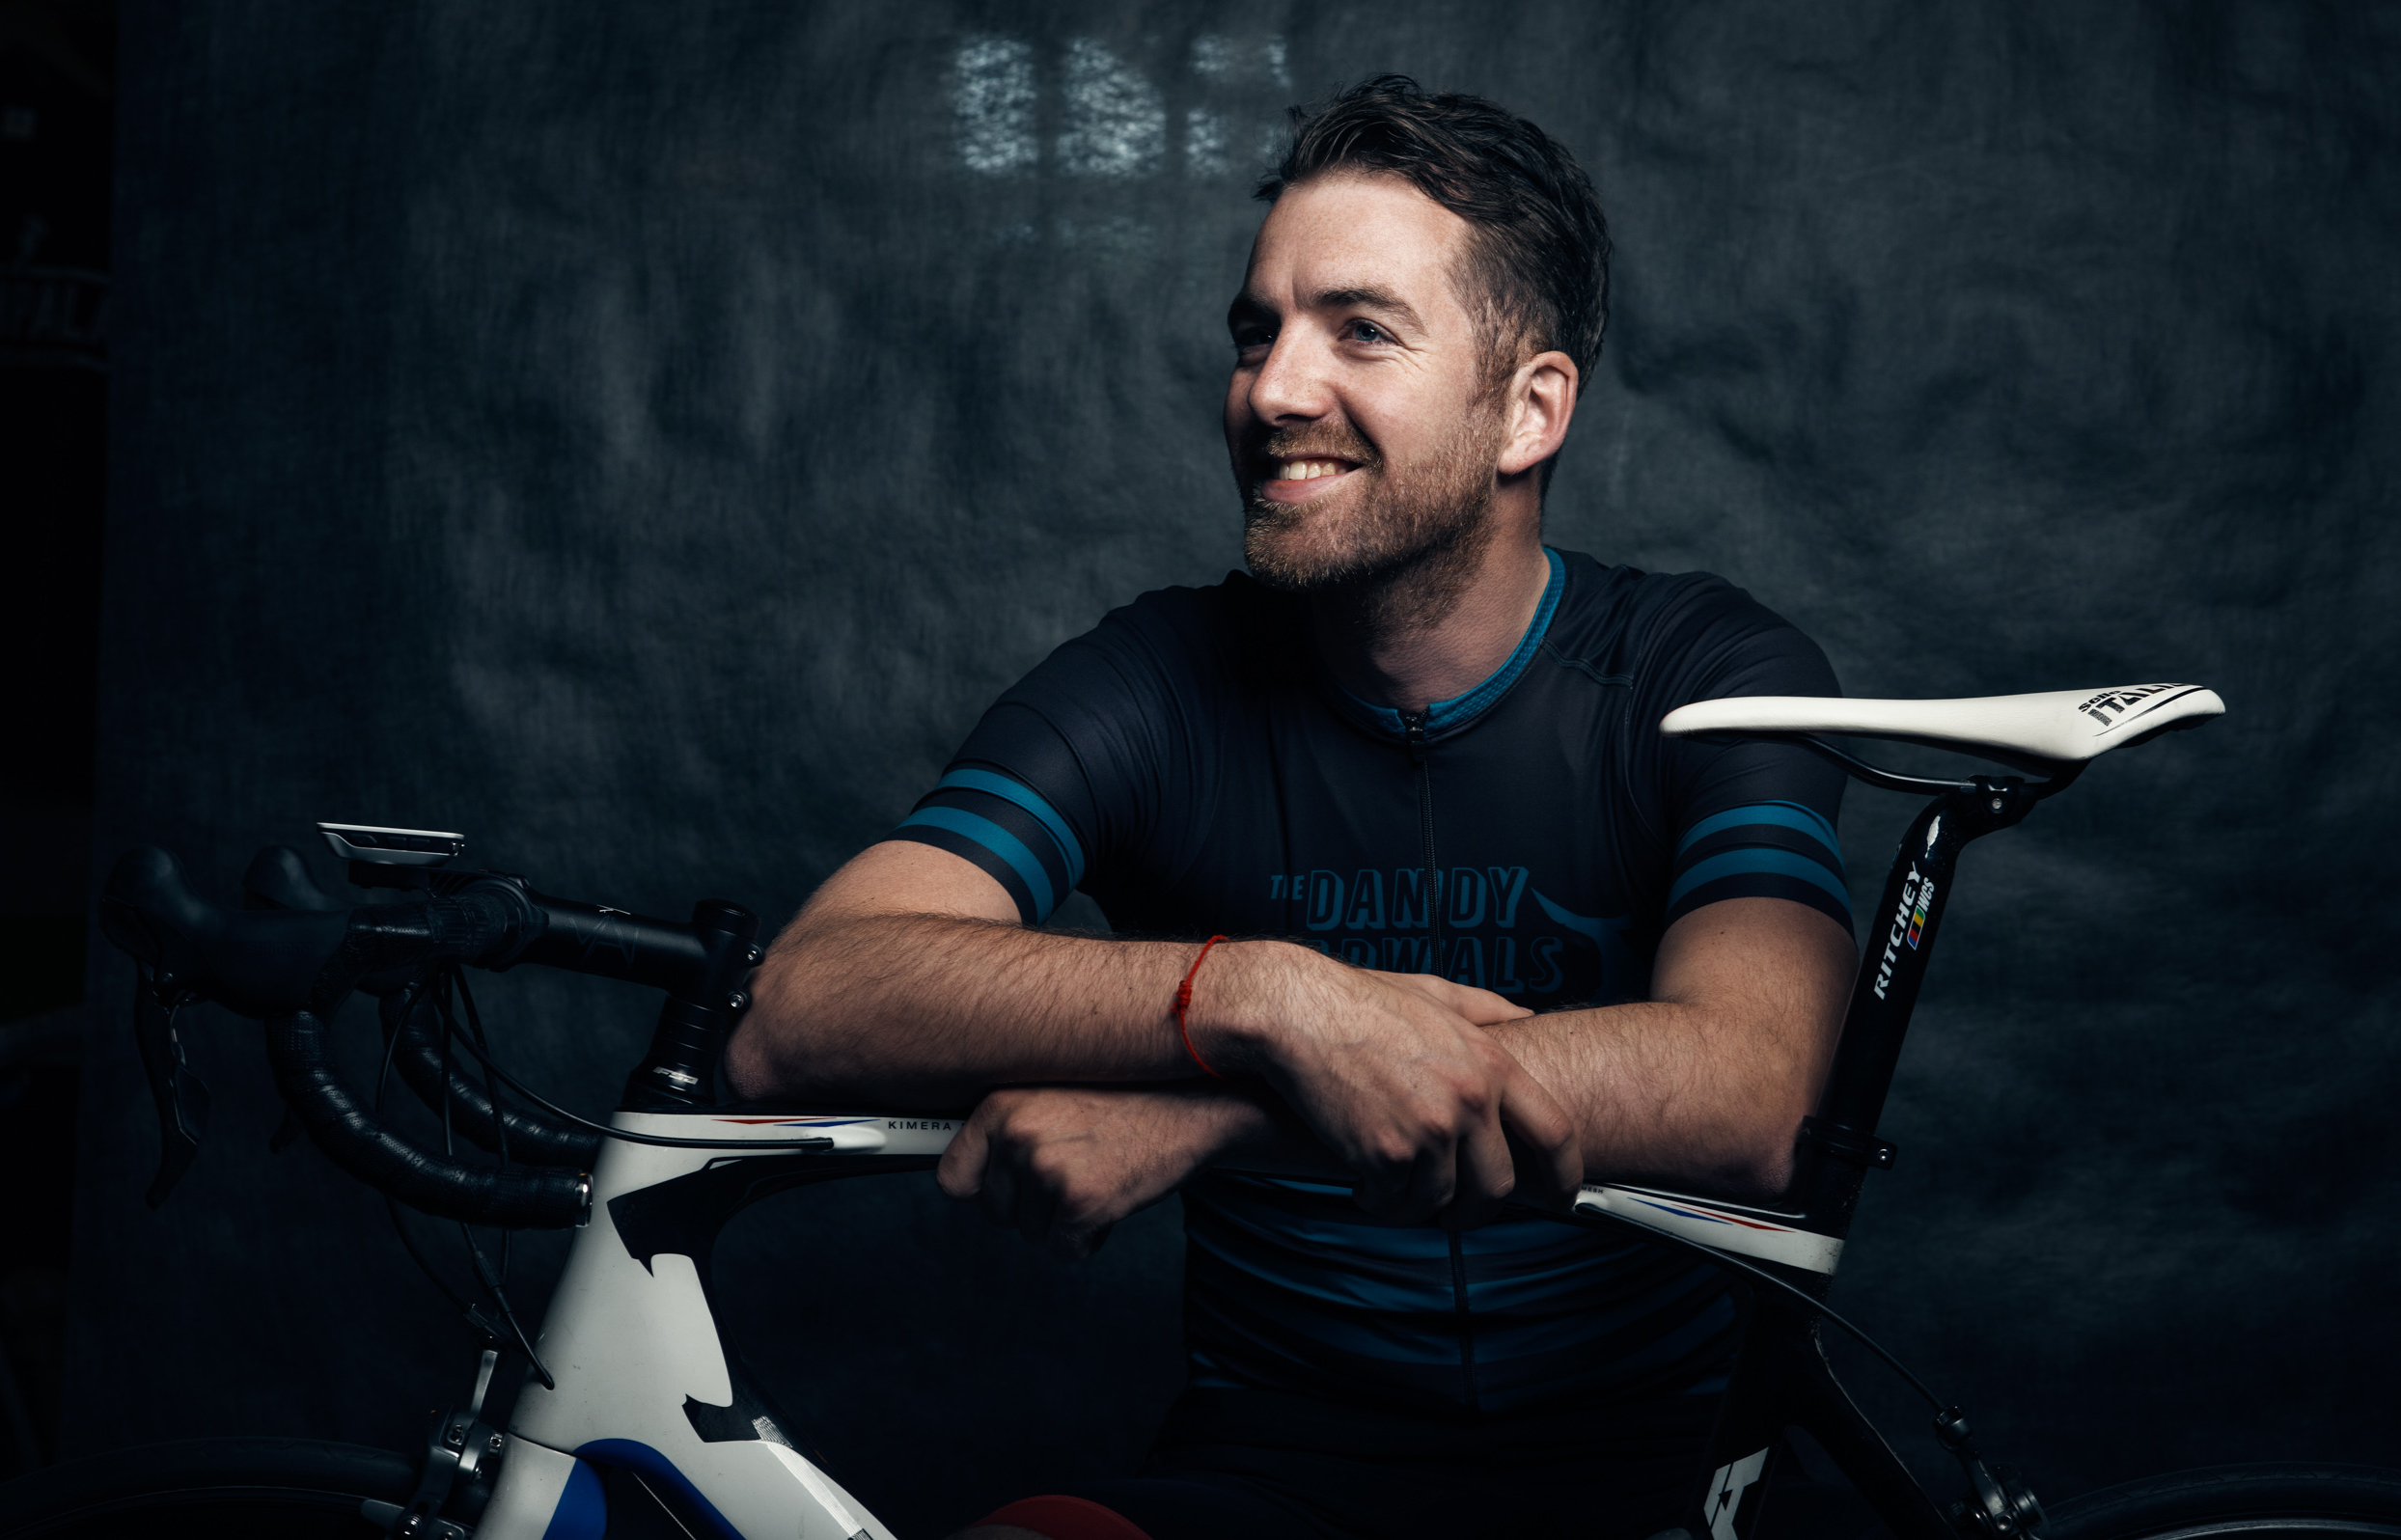 wielrenner, lola bikes, fietsclub, studio, portret, fiets, zadel, stoer, tough, man, machine